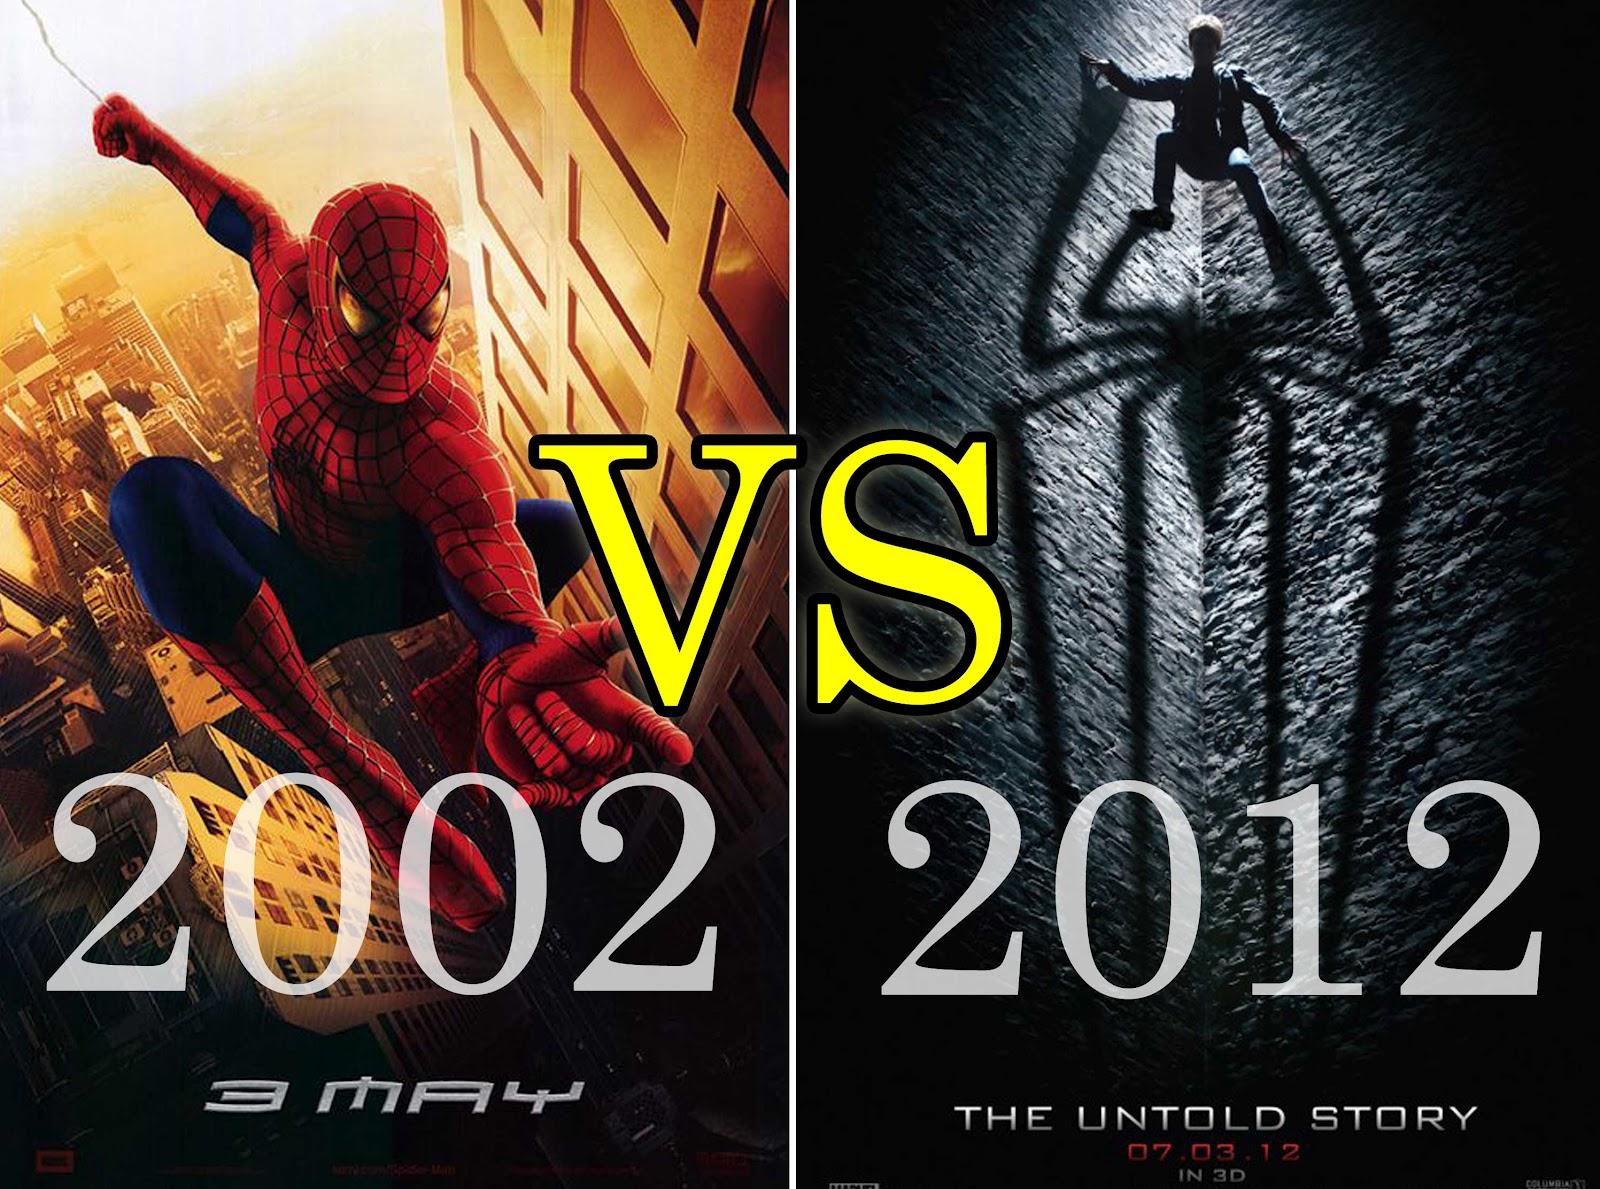 http://1.bp.blogspot.com/-tJdlUKYec_4/T_tyupysdRI/AAAAAAAADeY/JDFghF0gAqc/s1600/SpidermanVs.jpg